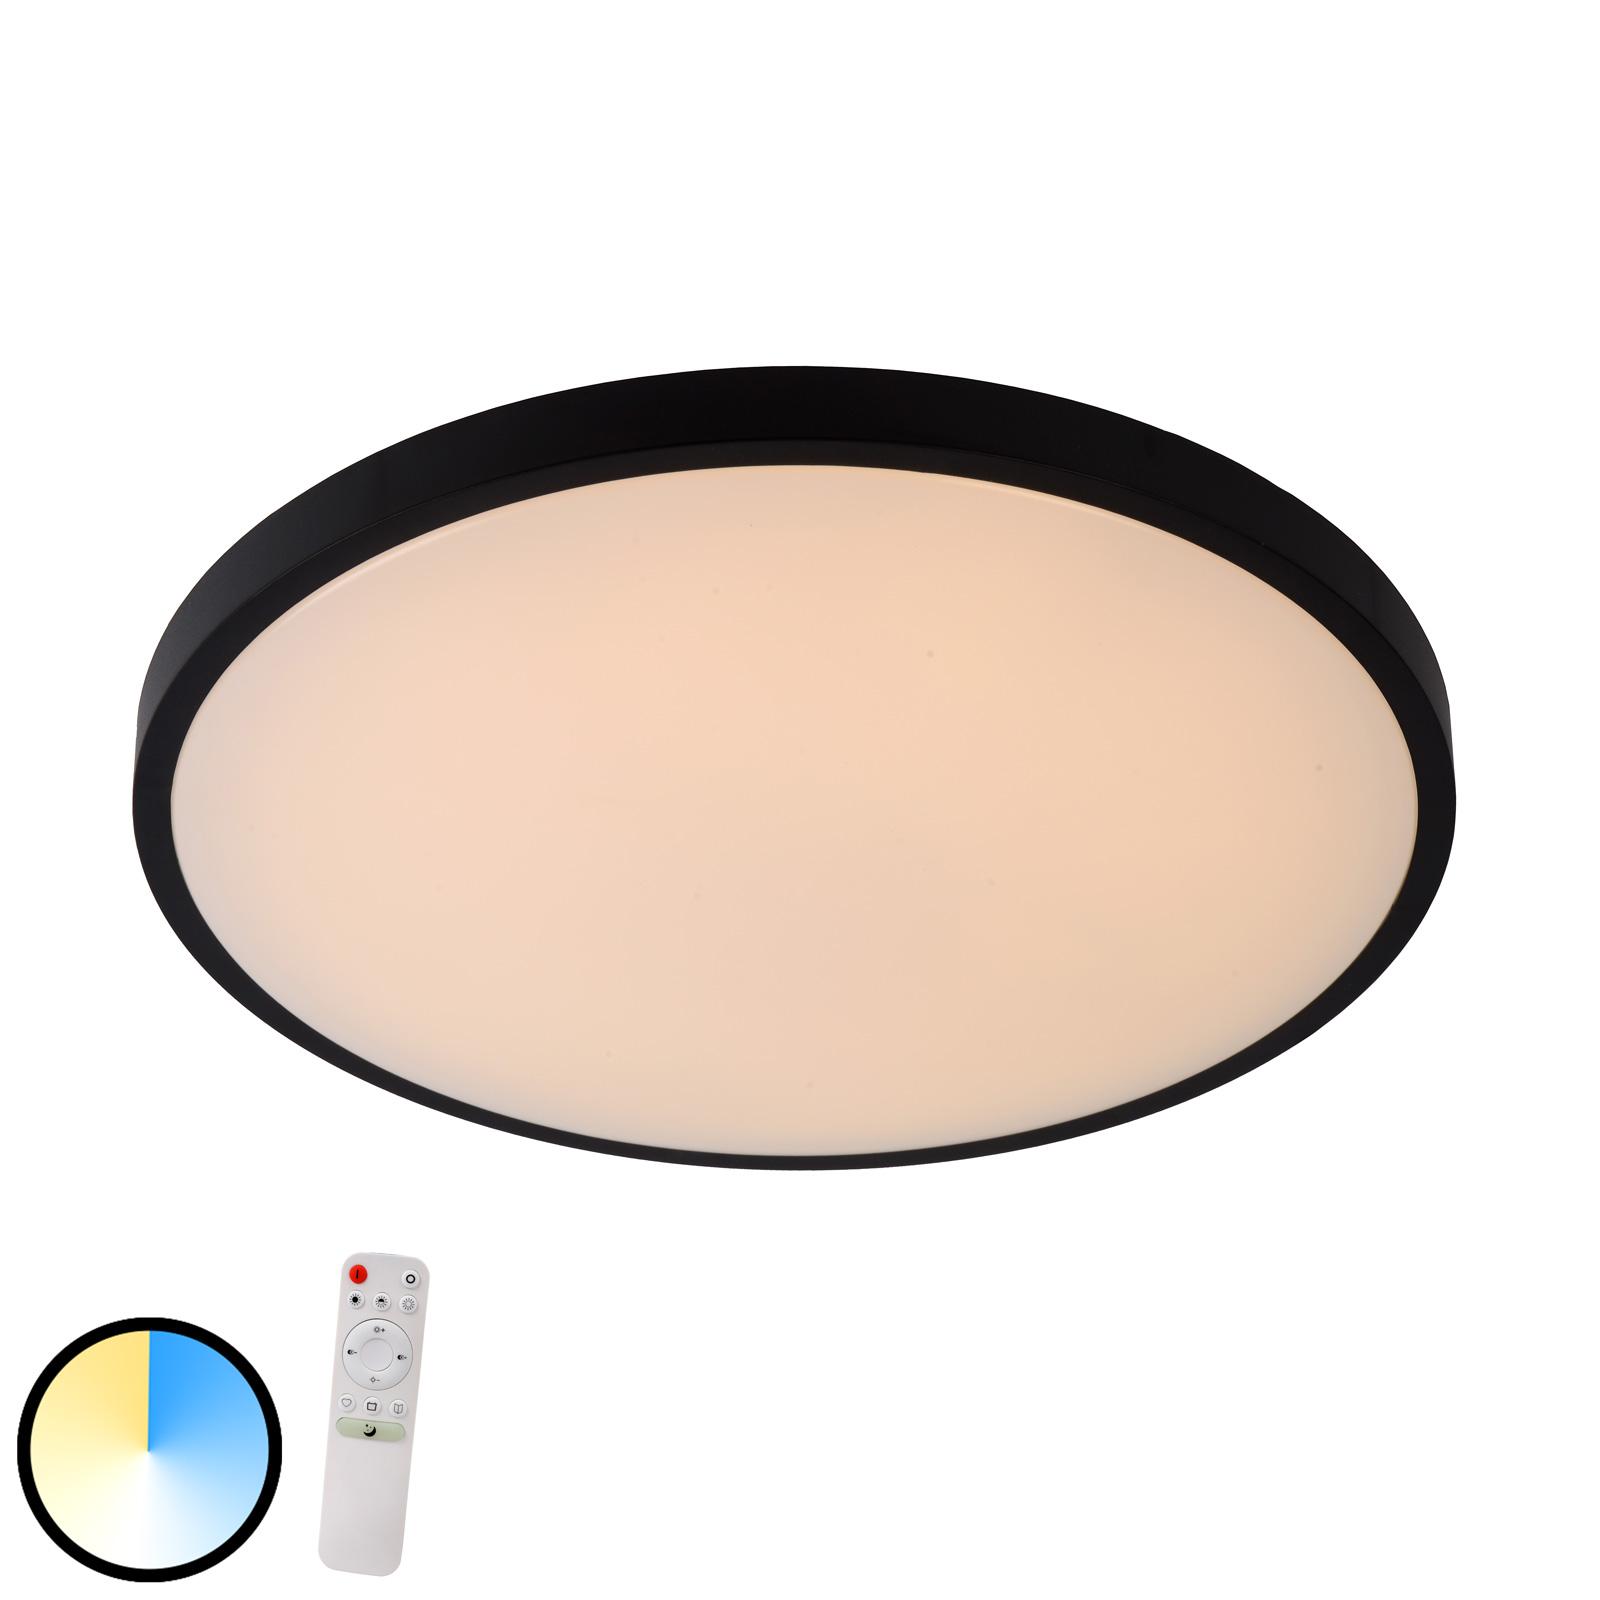 Polaris LED-loftlampe dim to warm, Ø 45,7 cm